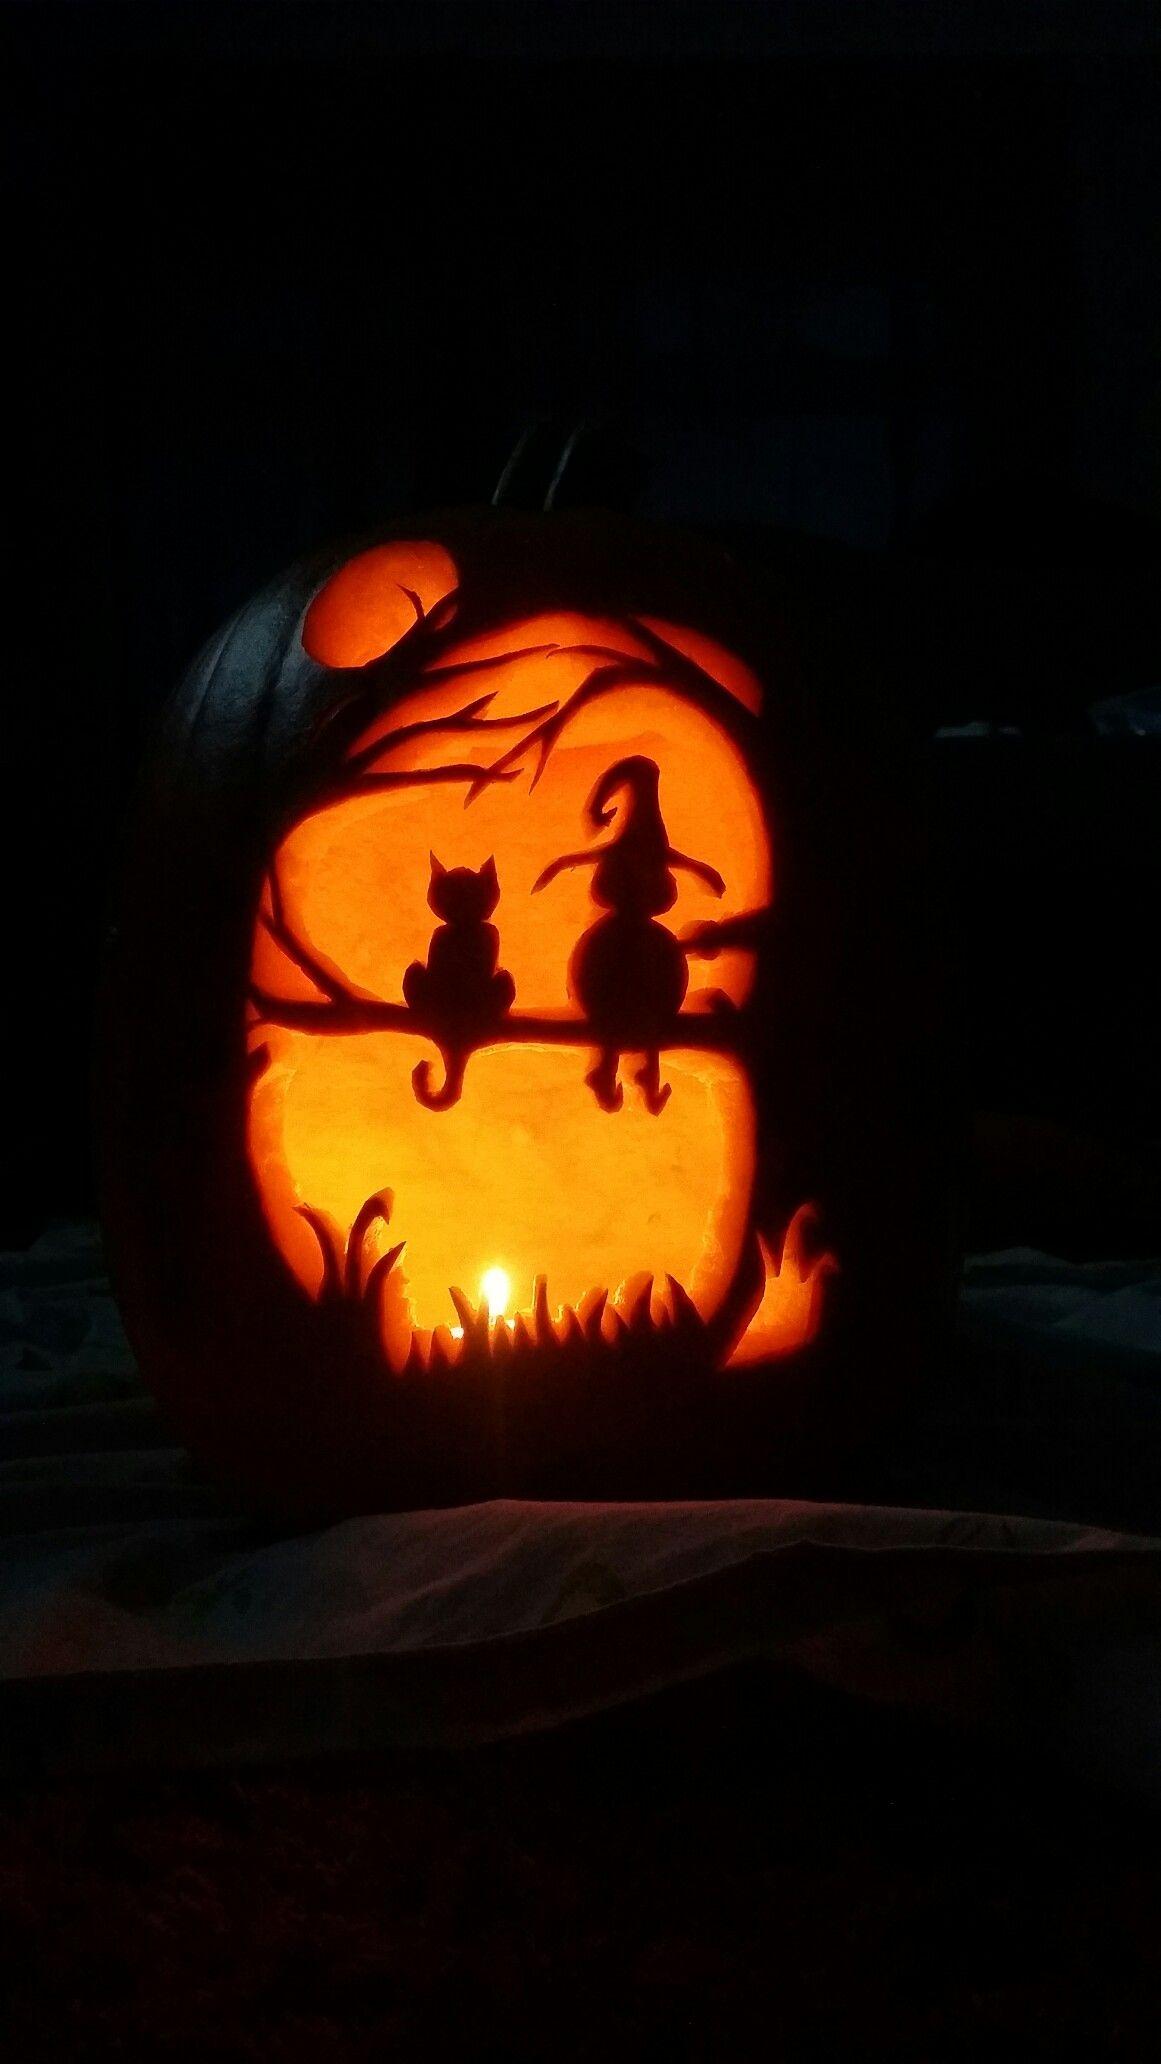 Witch n cat #pumpkins #carvings #halloween | halloween | Pinterest ...